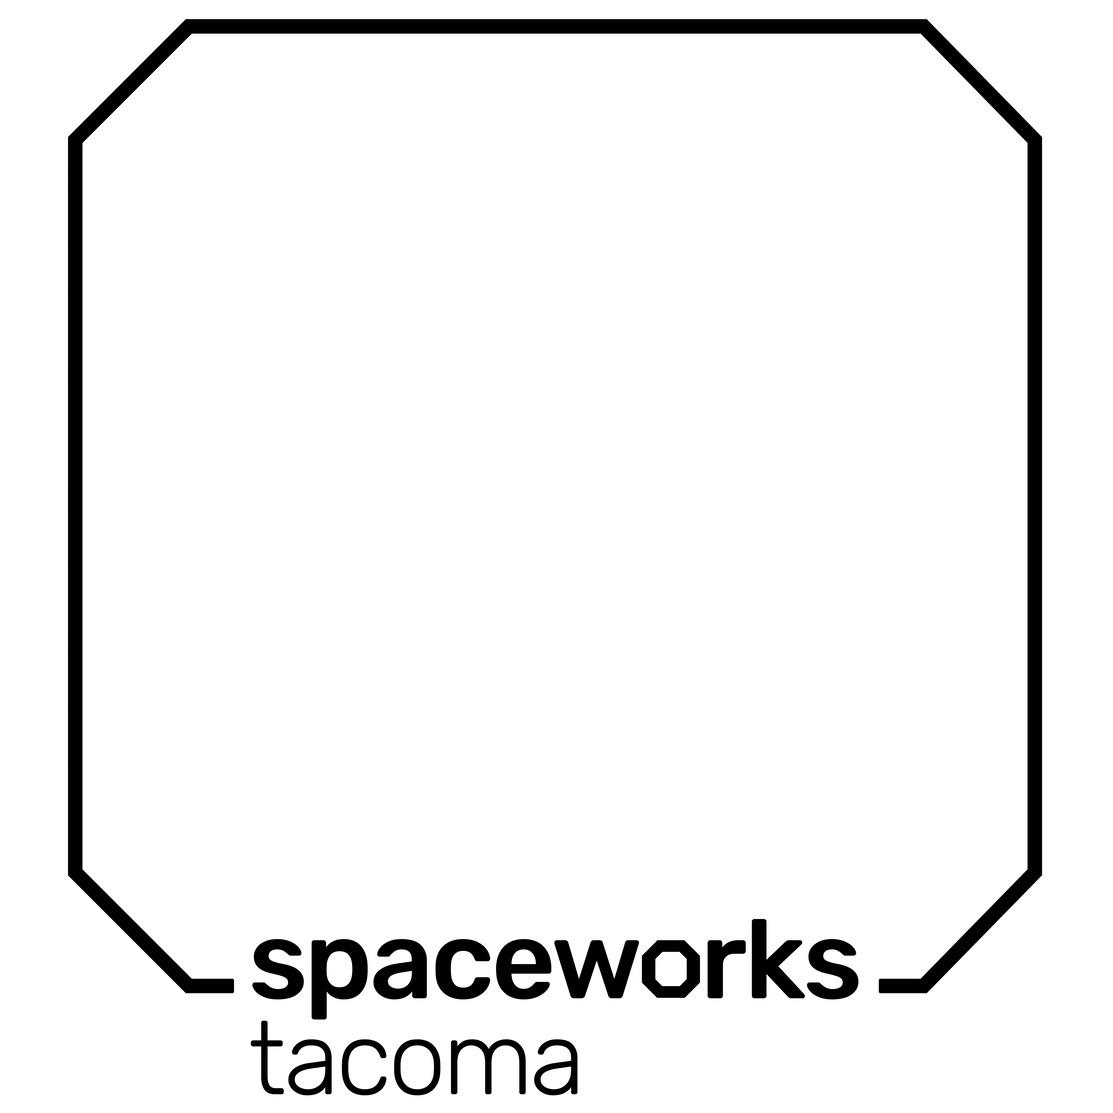 Spaceworks_Tacoma_Logo_Black